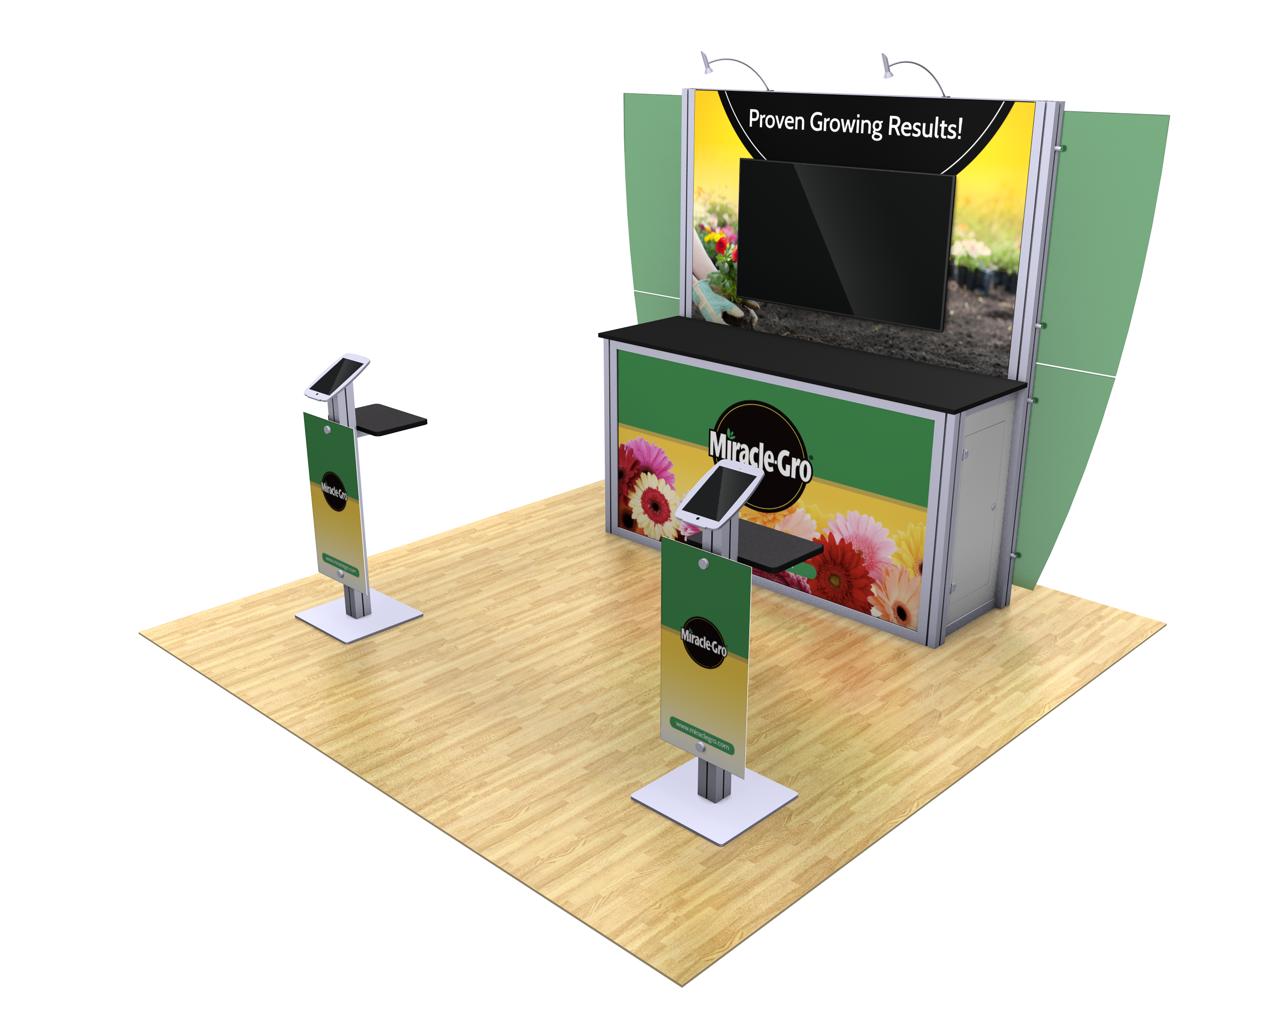 XVline Modular 10ft Trade Show Display Kit - 10.07